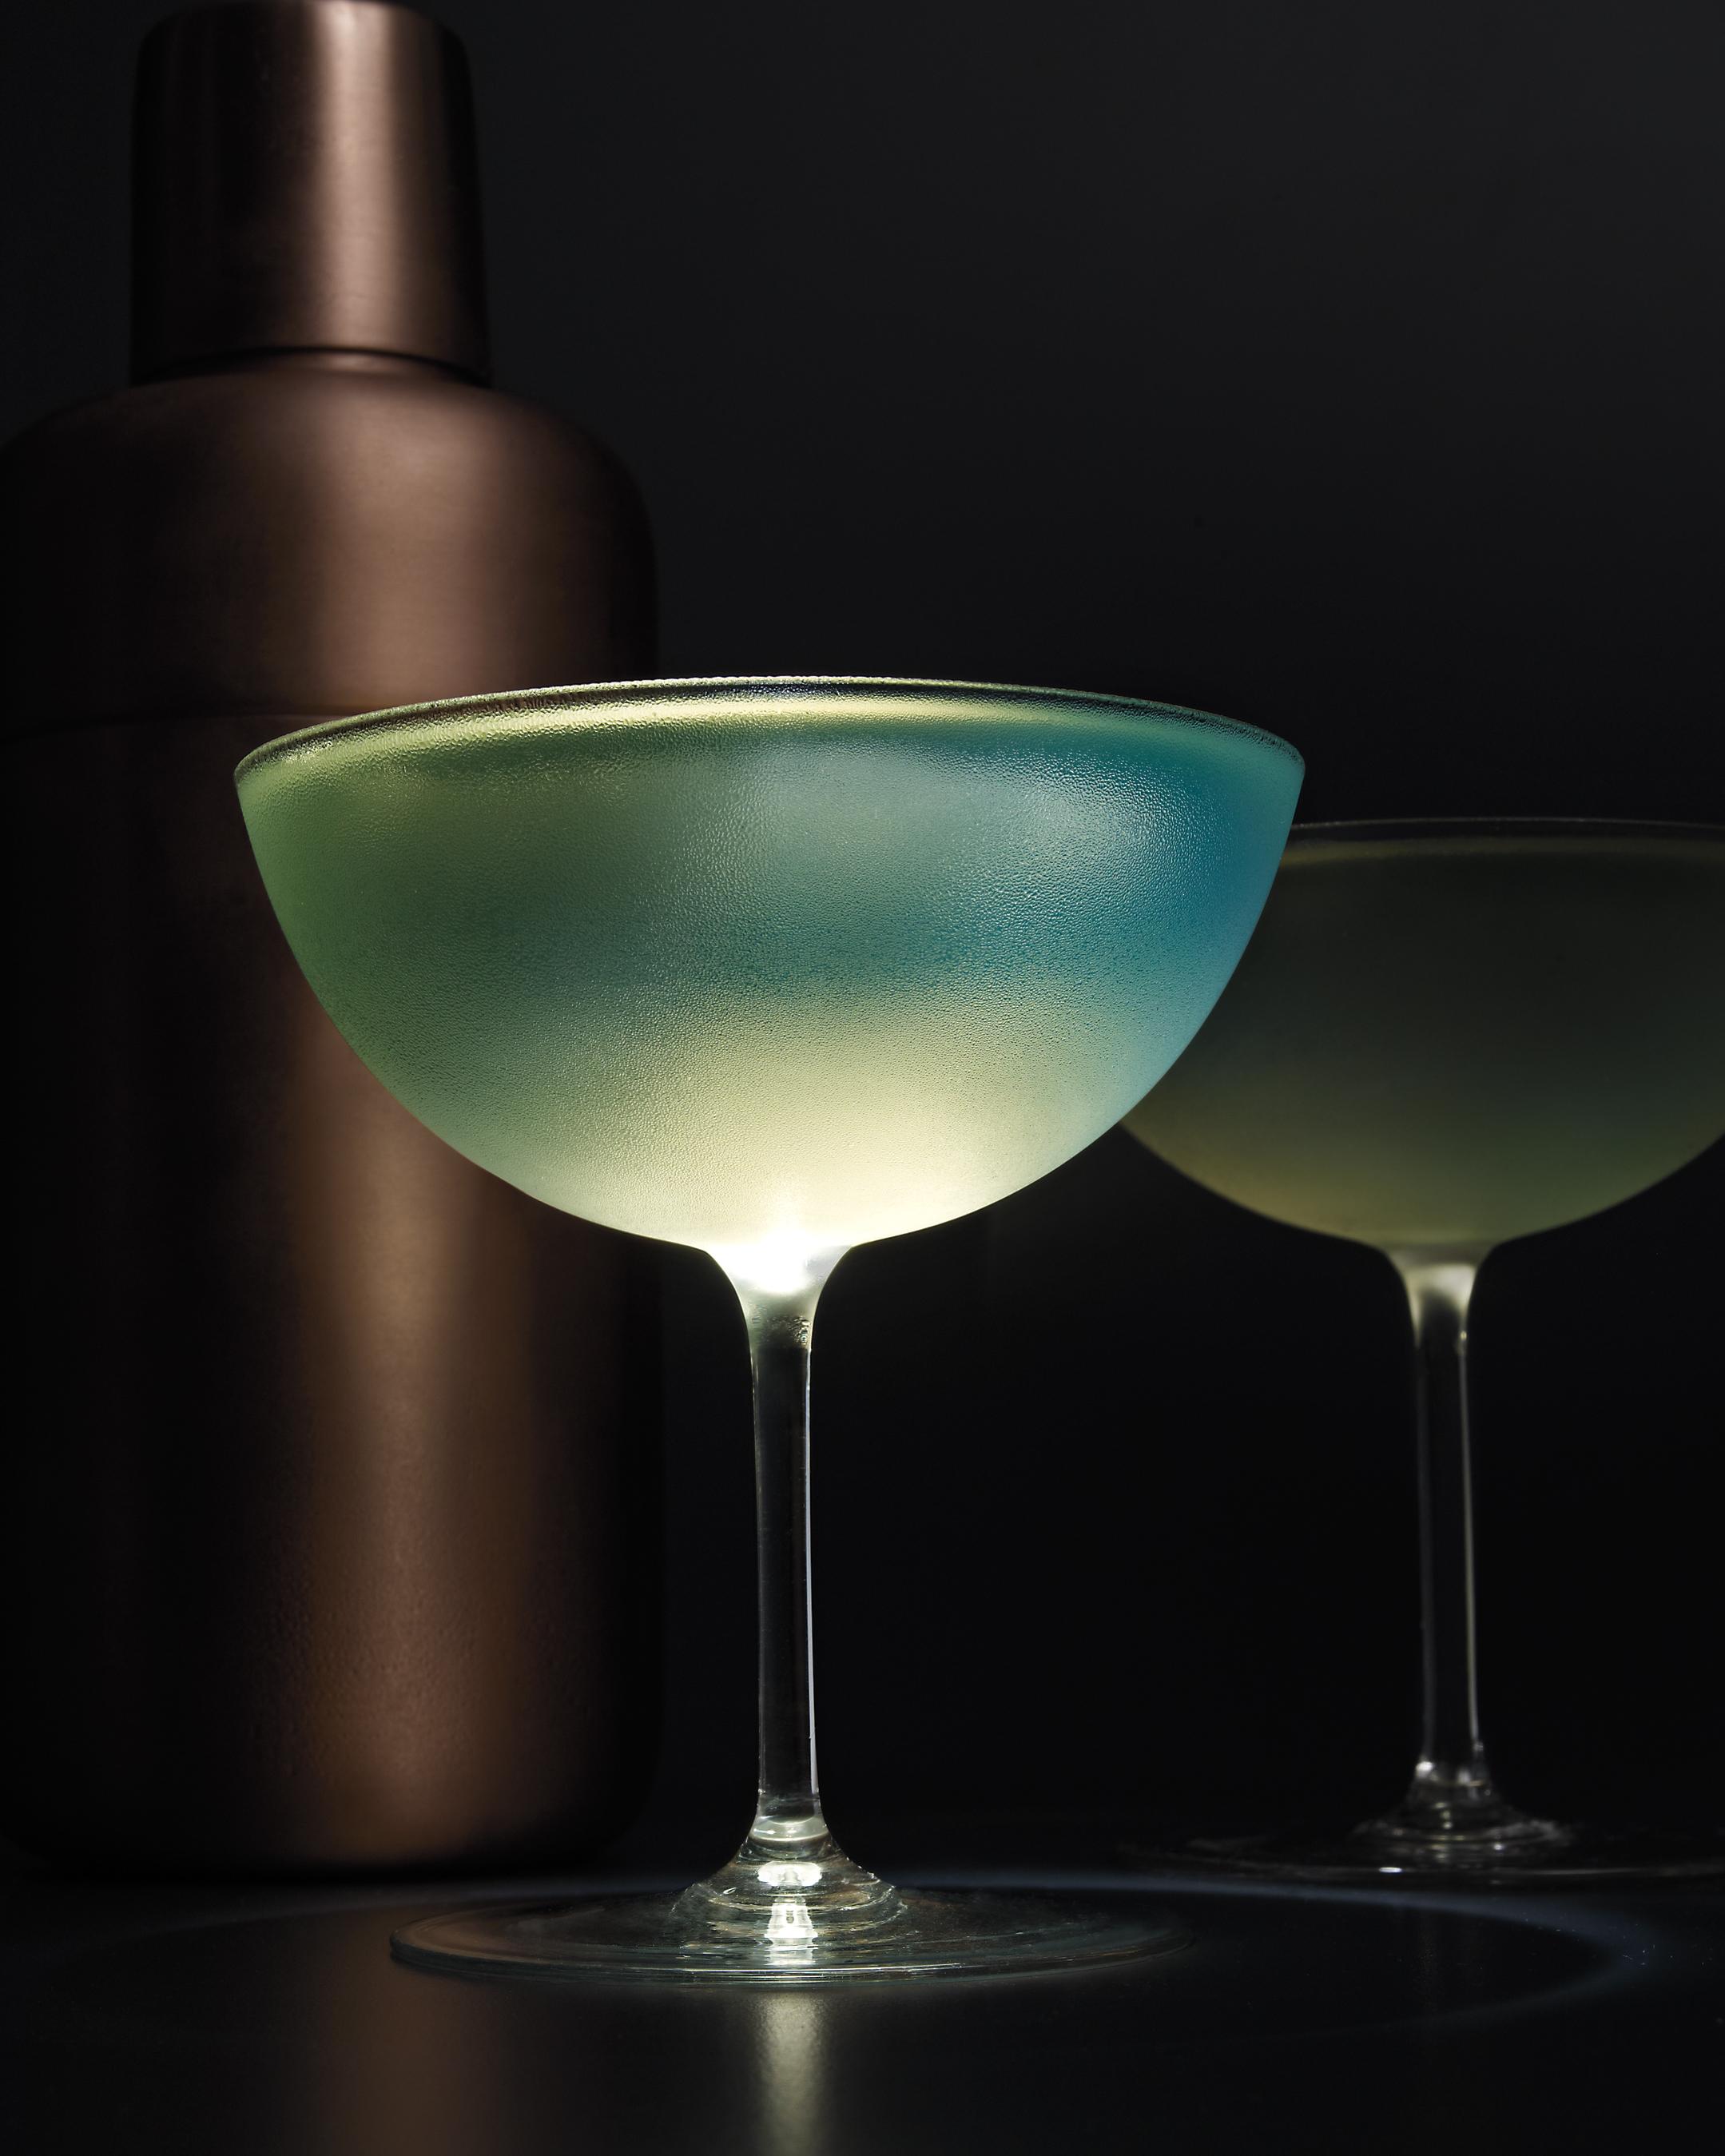 chartreuse-martini-0341-md110526.jpg